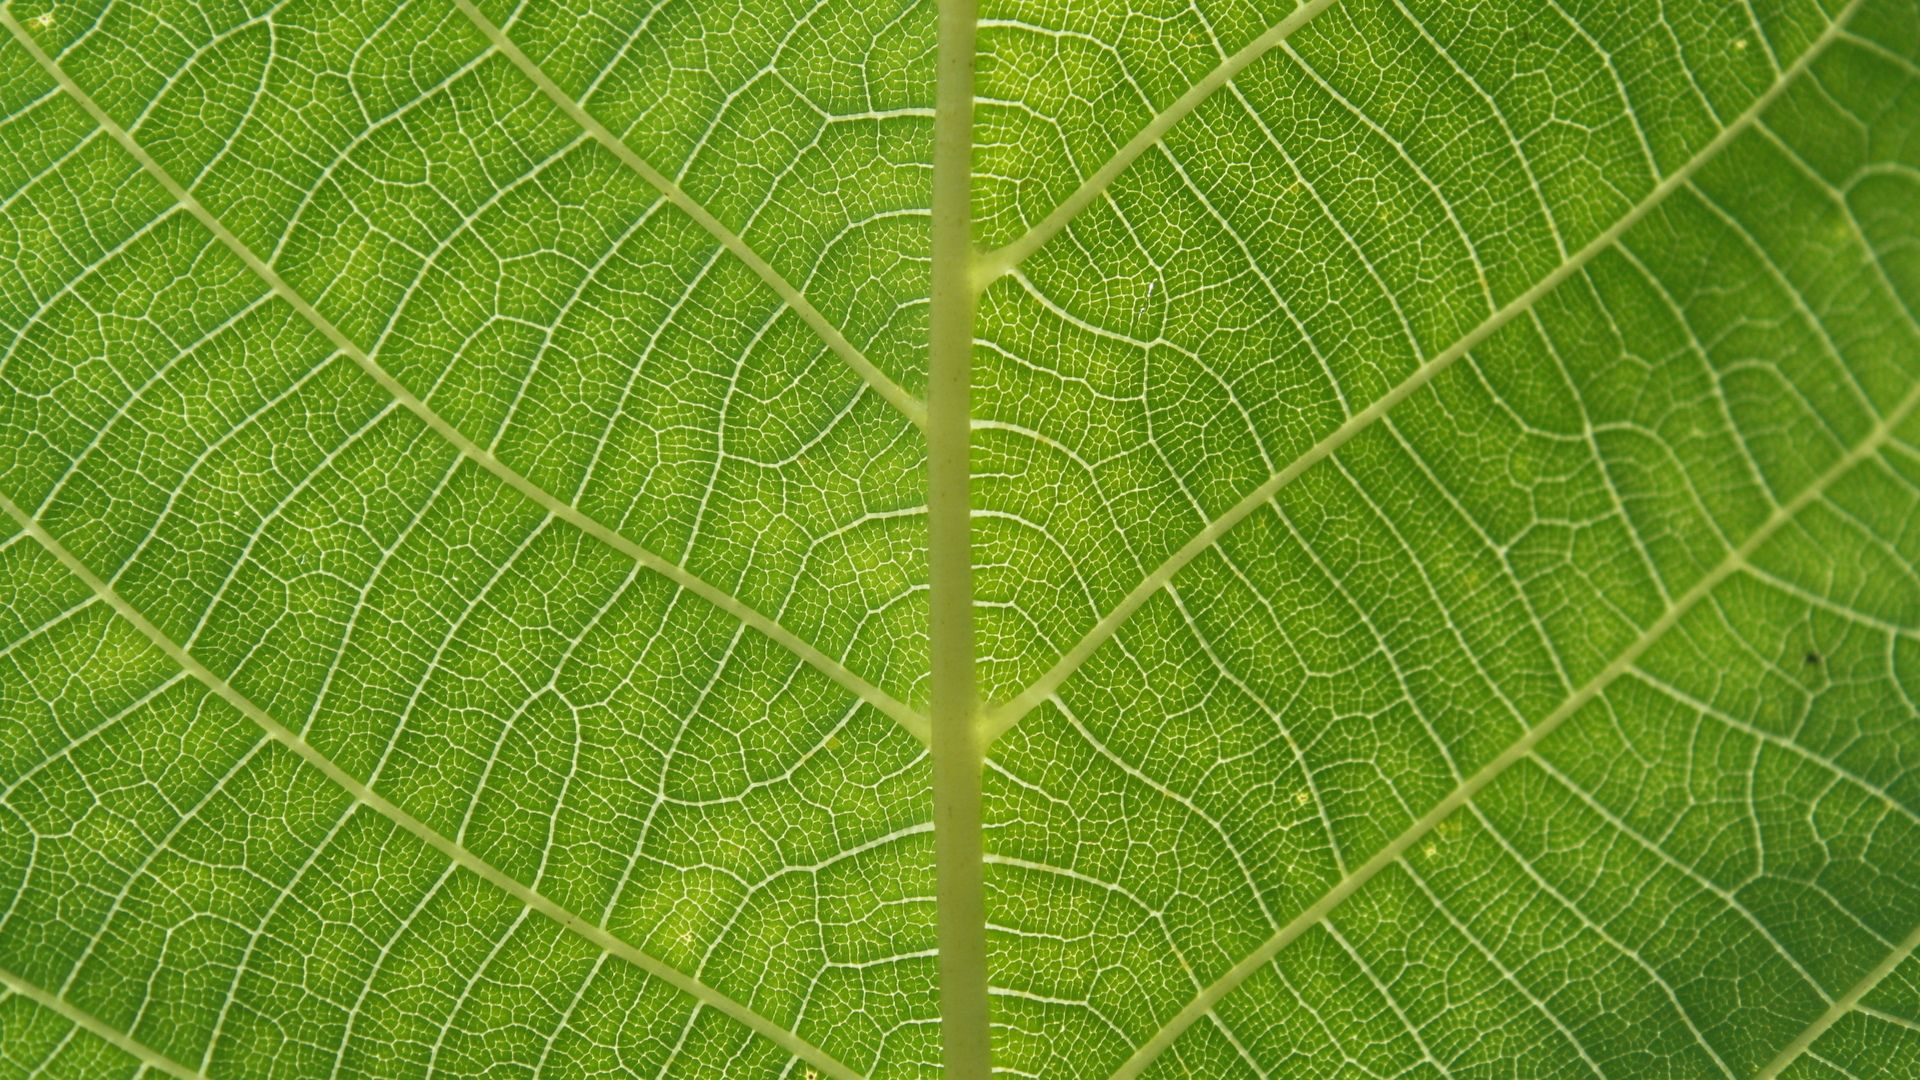 Leaf Pattern full wallpaper